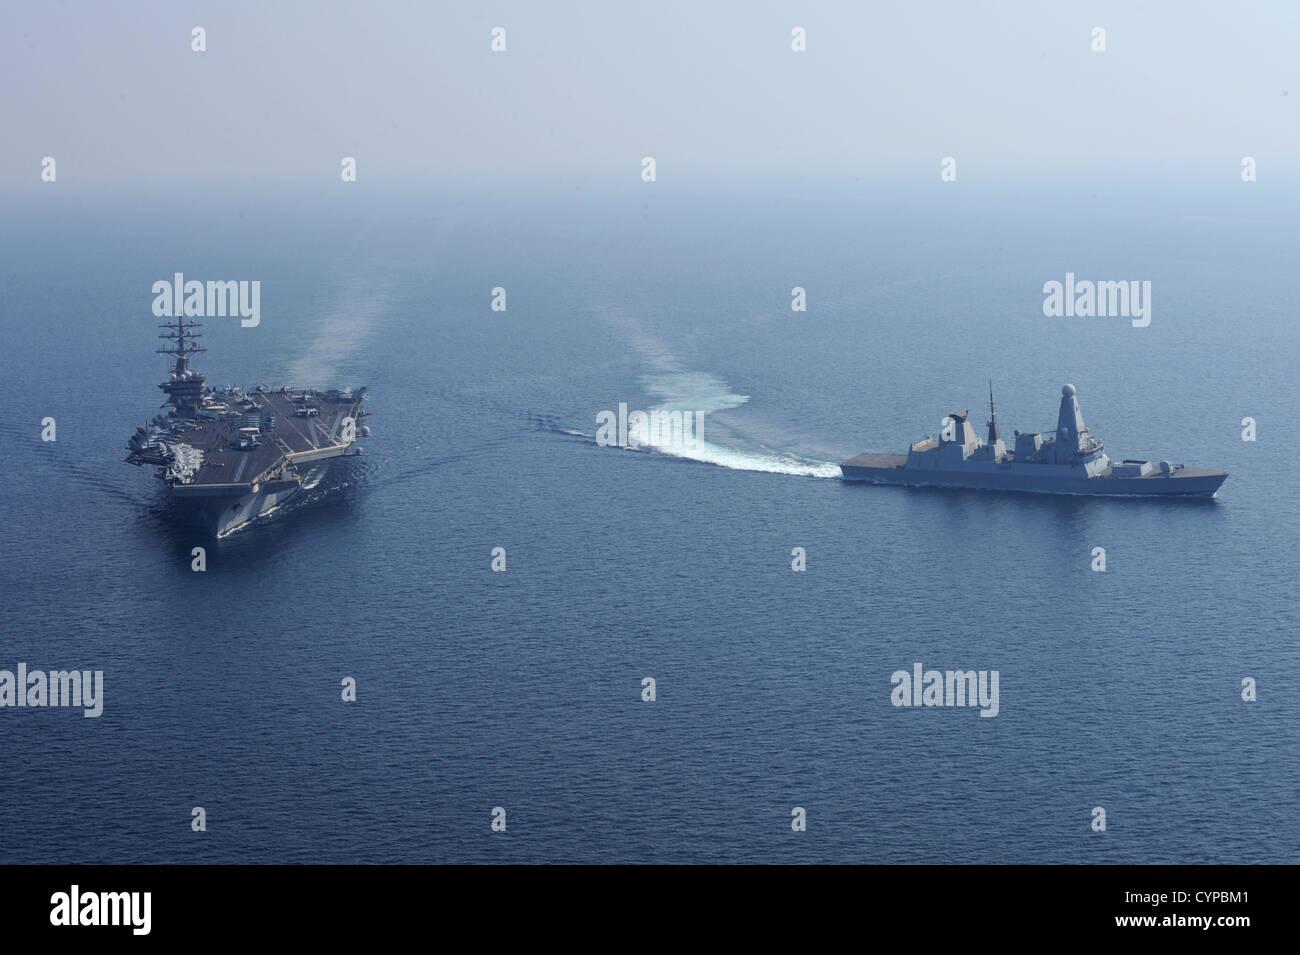 The Royal Navy destroyer HMS Diamond (D34) turns away from the aircraft carrier USS Dwight D. Eisenhower (CVN 69). - Stock Image